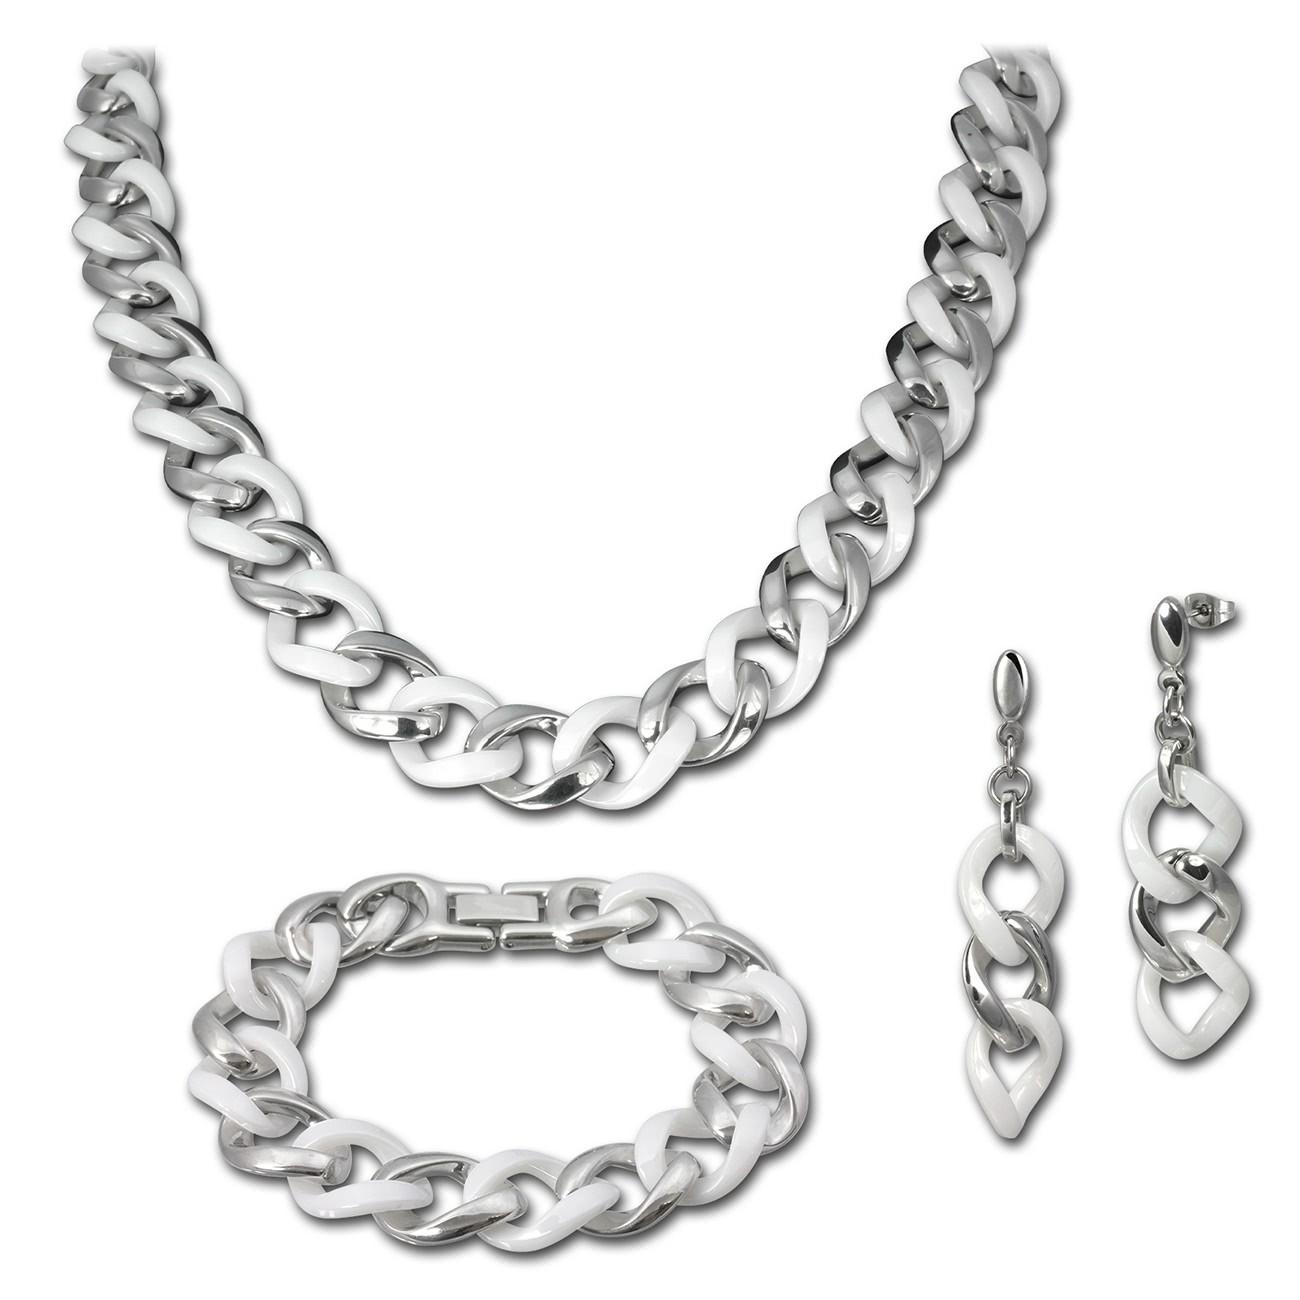 Amello Edelstahlschmuckset Keramik Kette, Armband, Ohrring ESSX10W